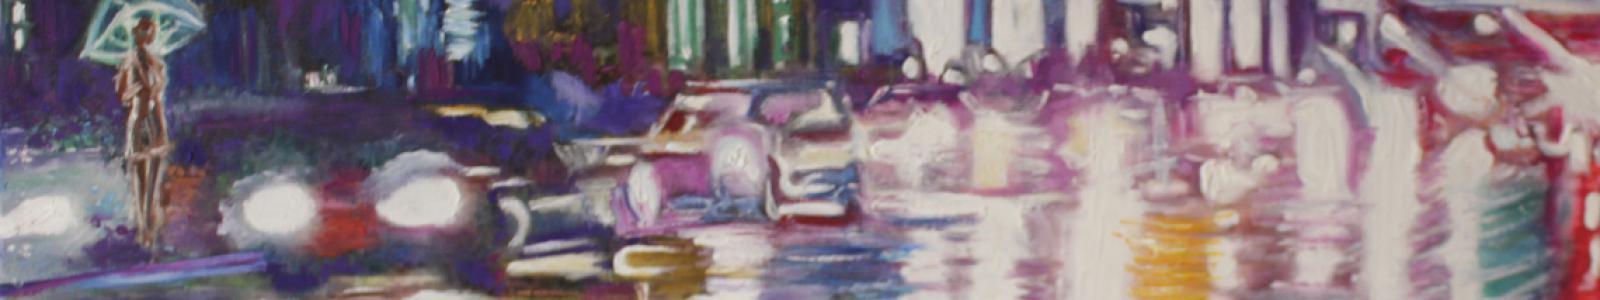 Gallery Painter Alex Pelesh